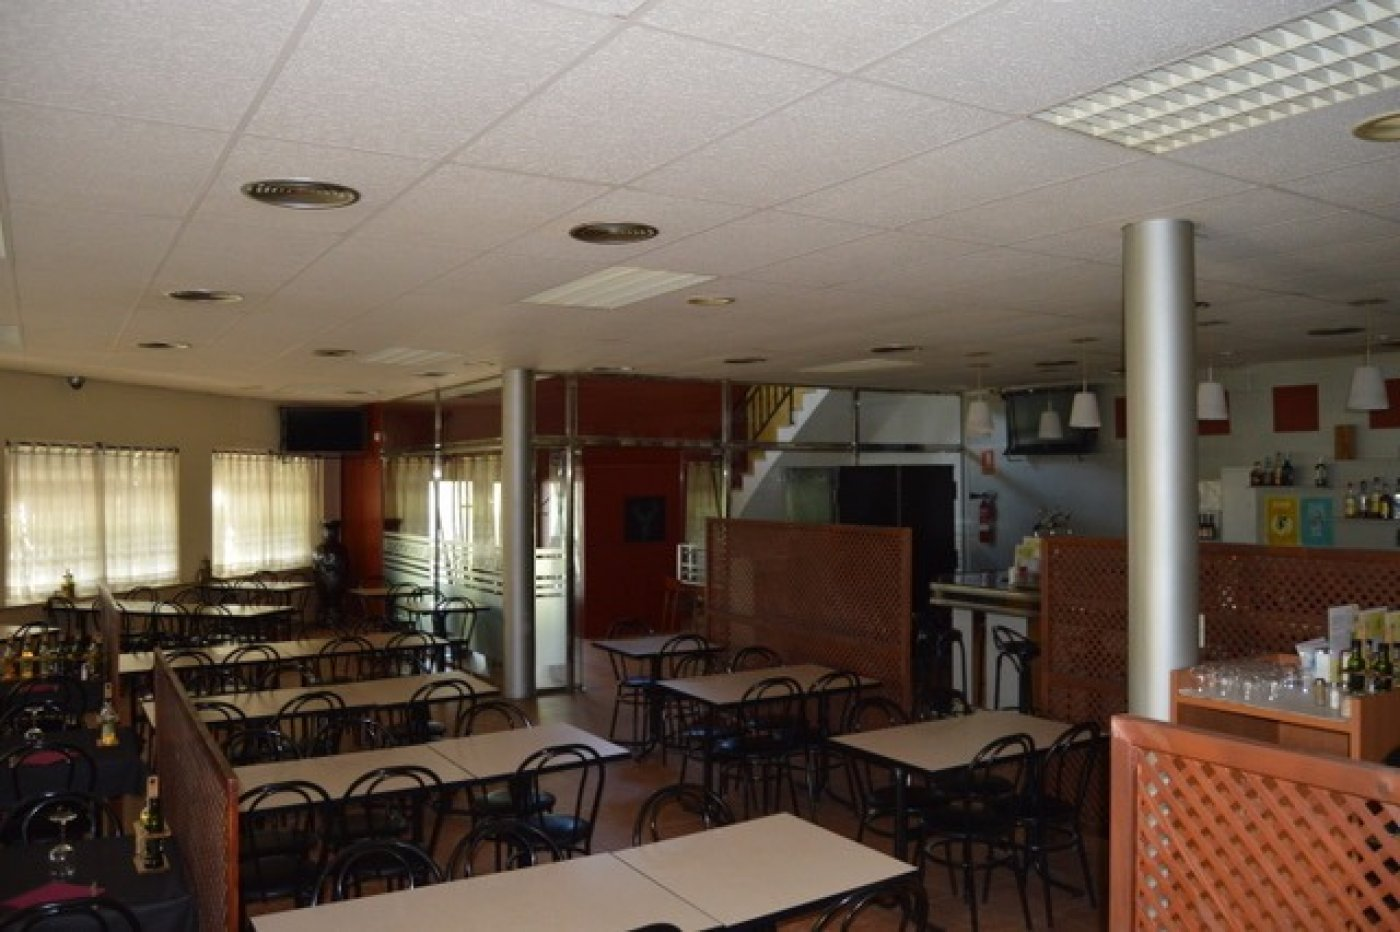 Nave restaurante en polígono cerca de sant sadurní d´anoia - imagenInmueble13